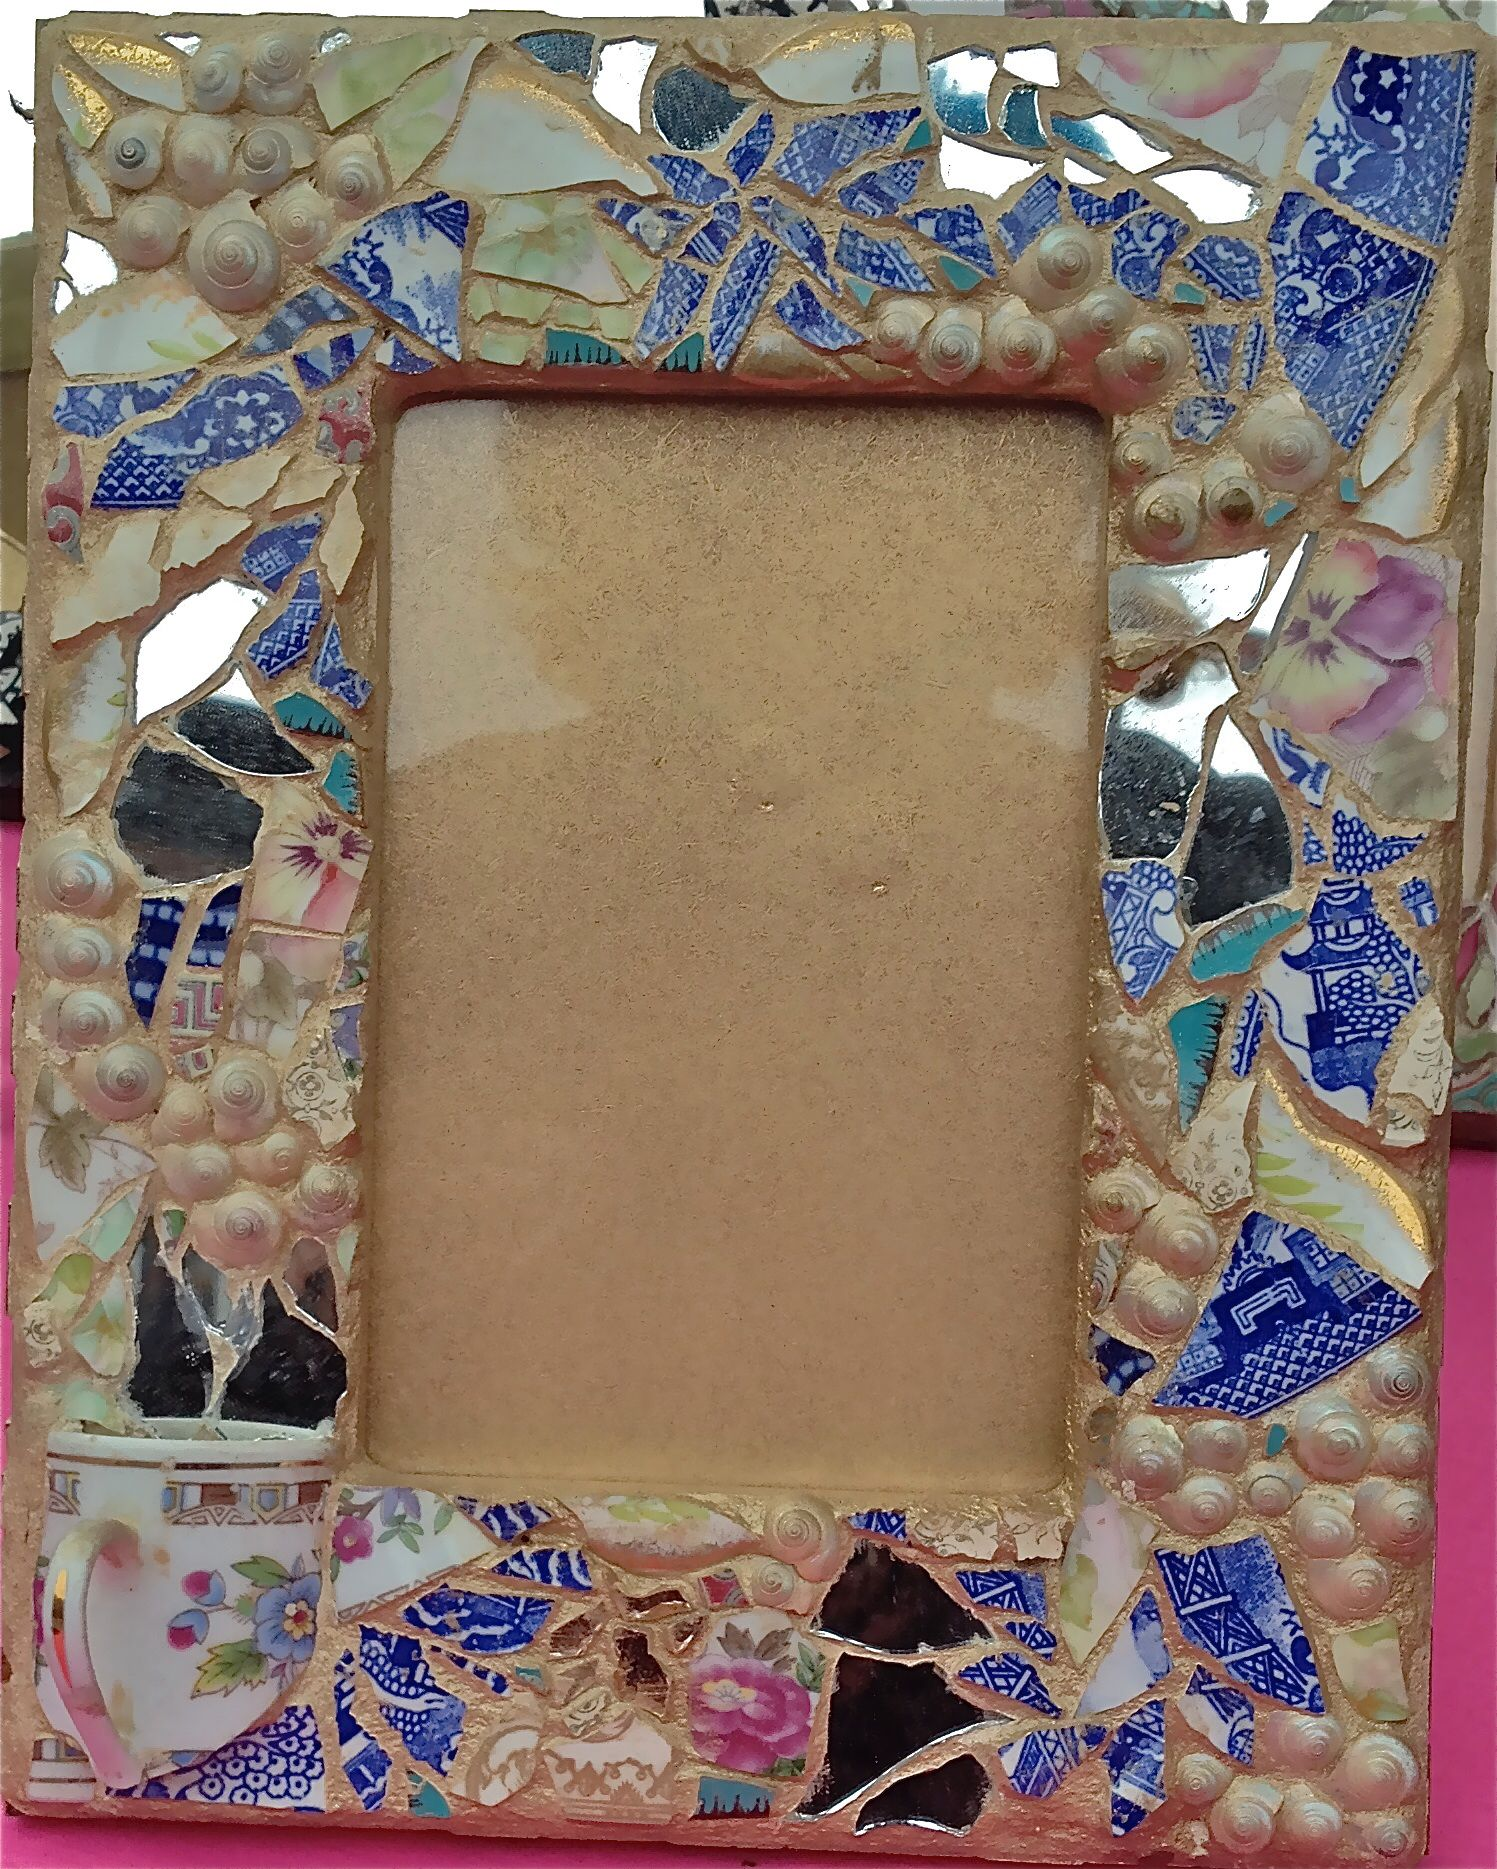 Mosaic Picture Frames available @ Claudiagill.com   Mosaics I love ...